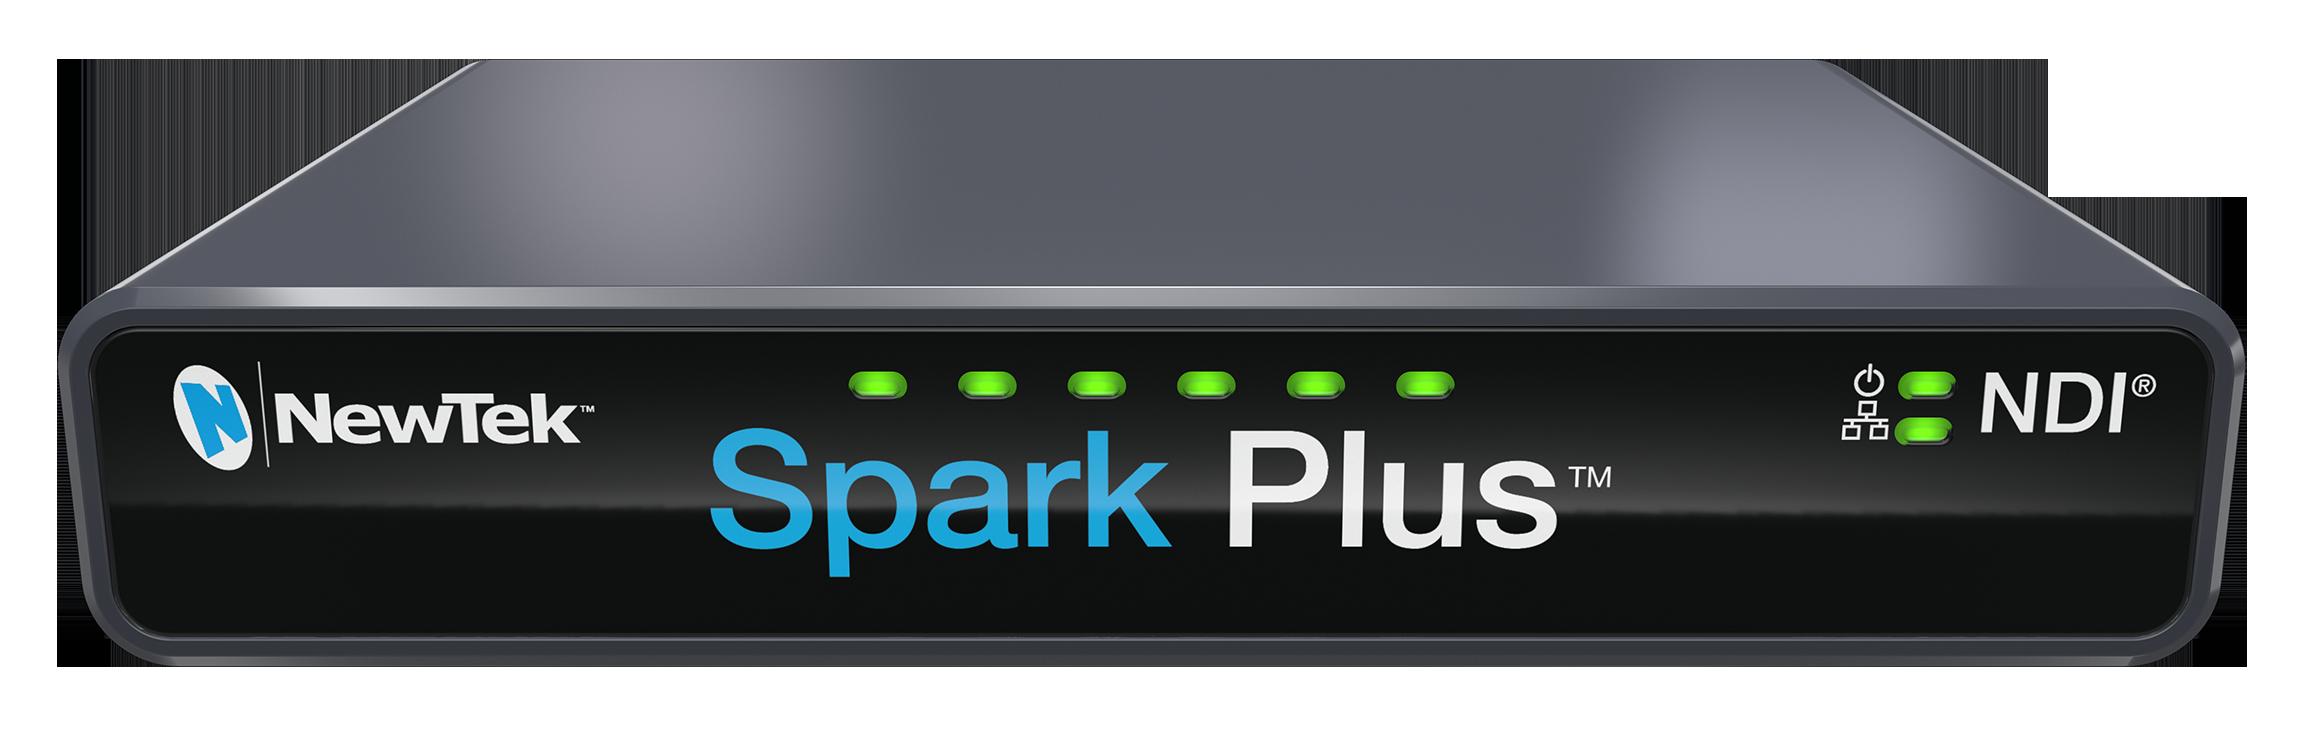 Newtek Spark Plus™4K